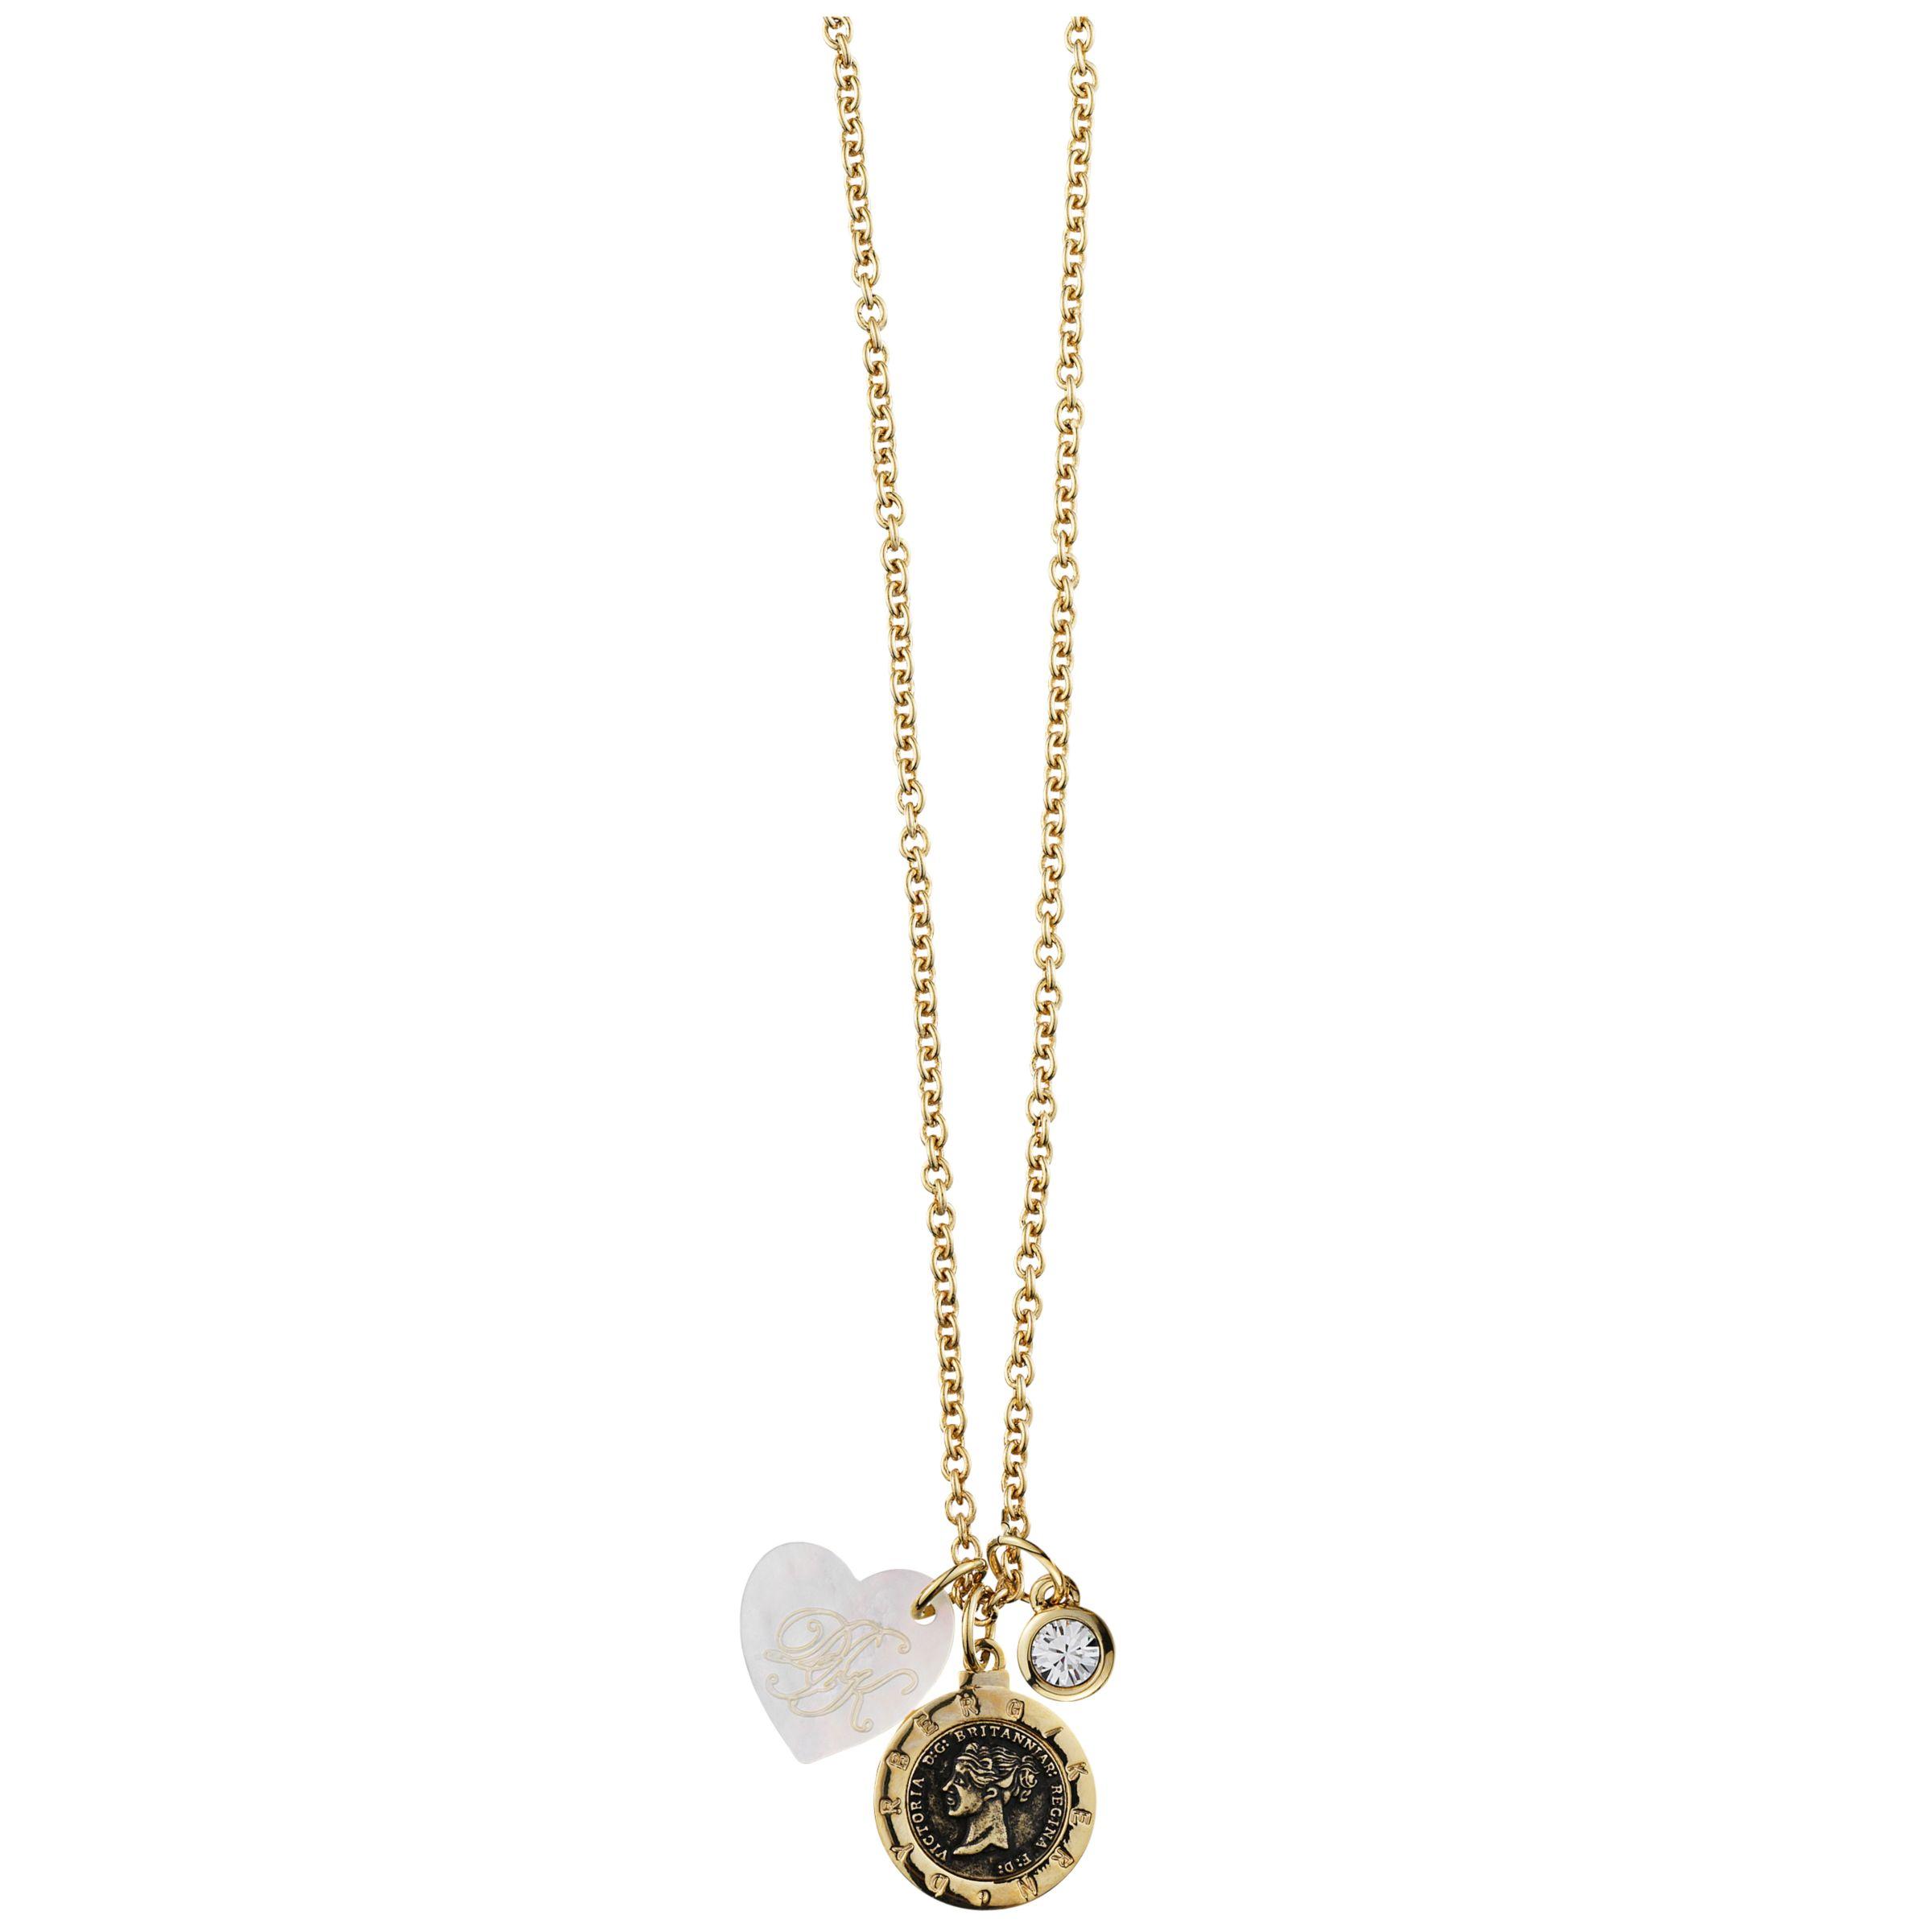 Dyrberg/Kern Constancia Swarovski Crystal Pendant Cluster Gold Necklace